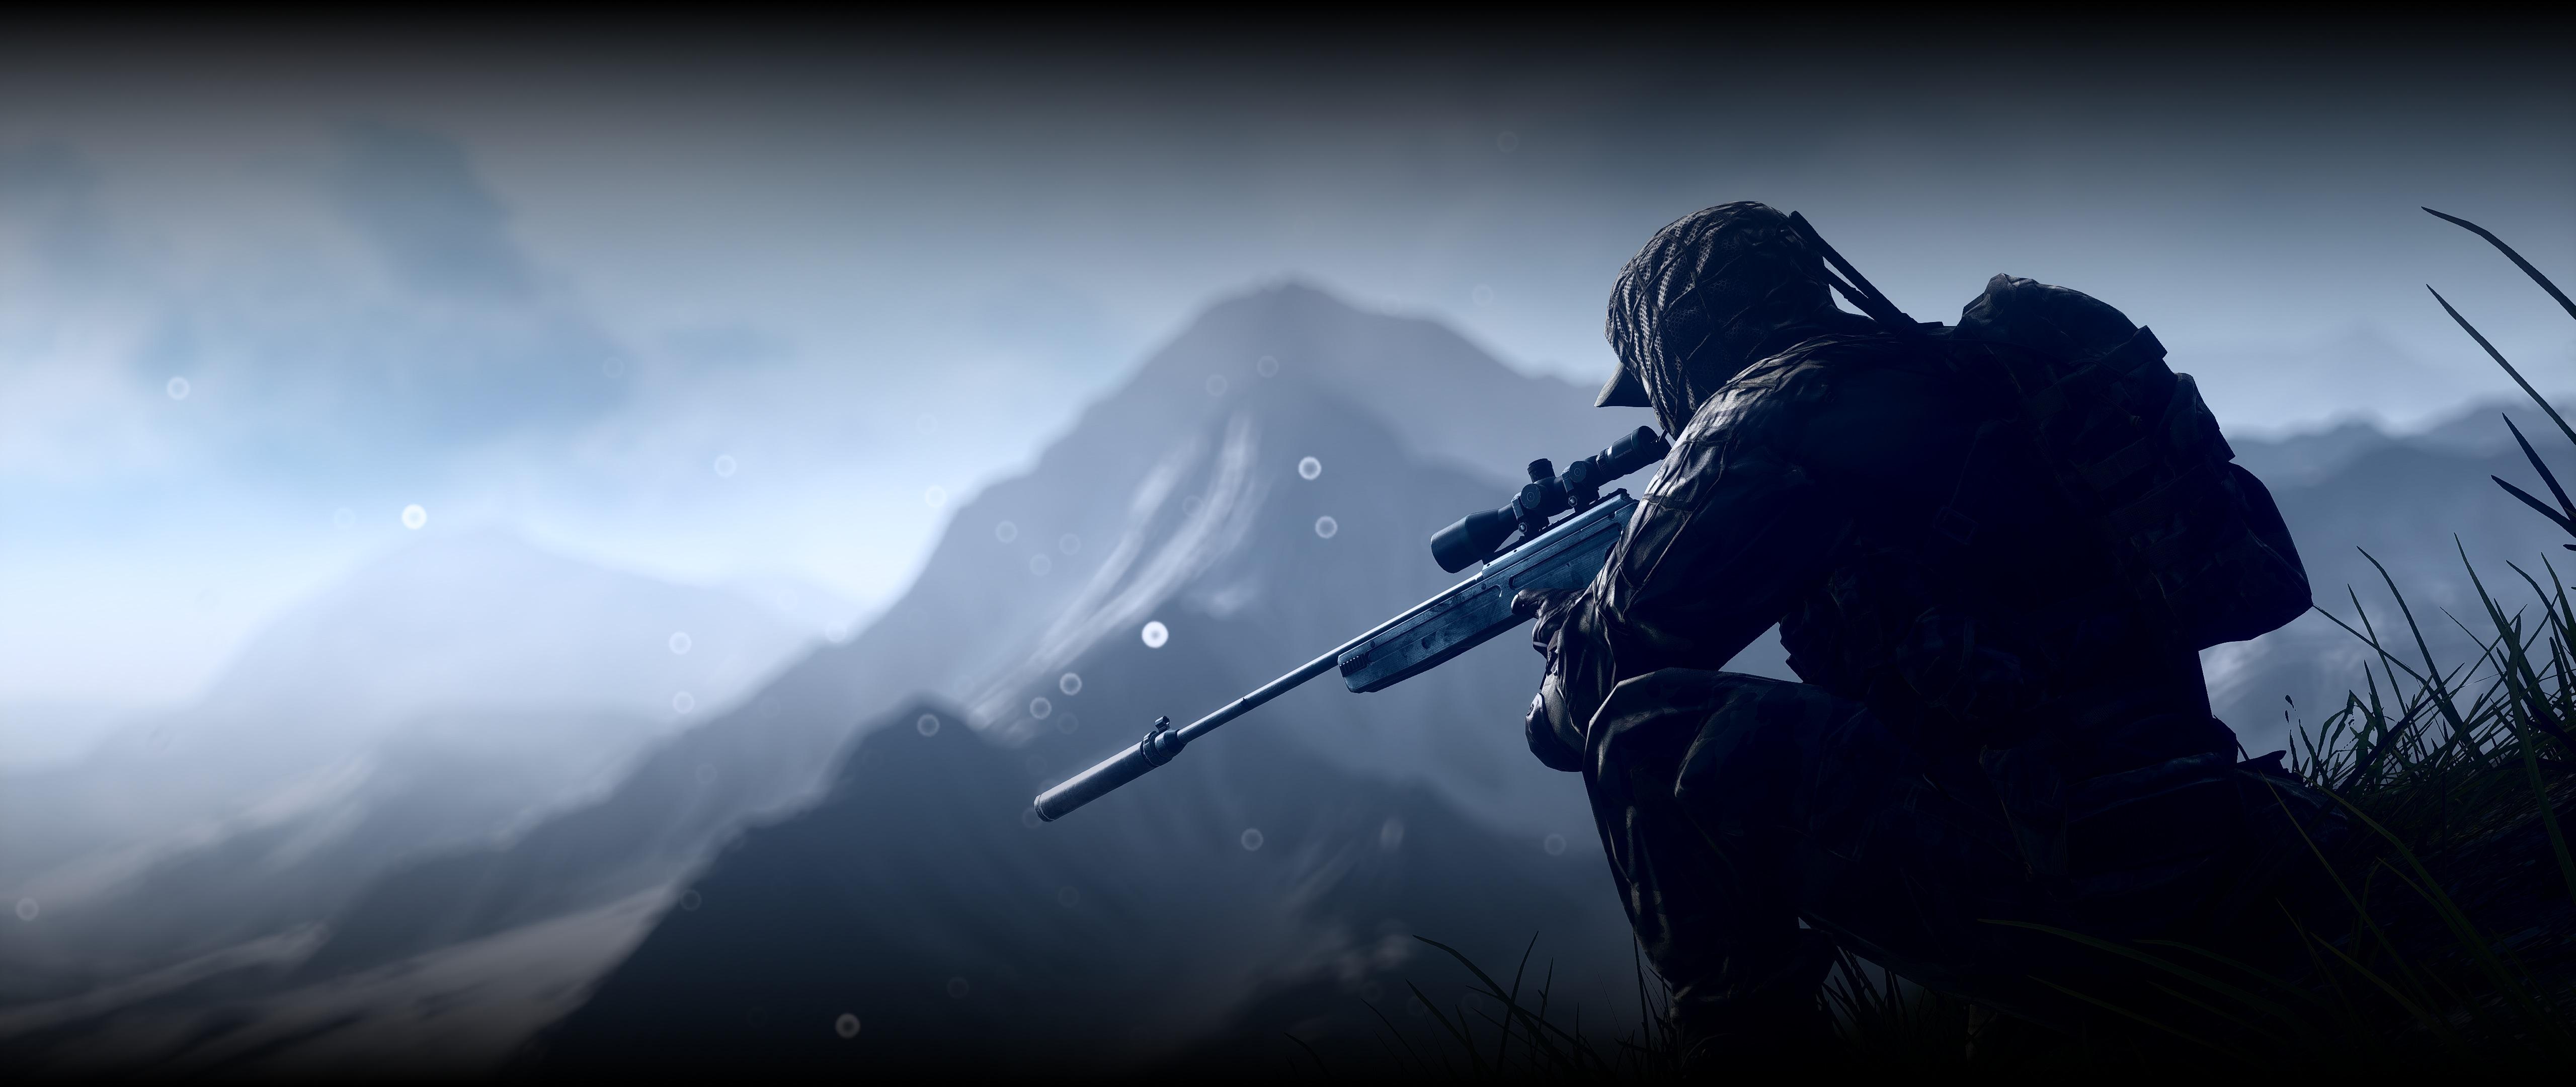 Battlefield 4 soldier hd games 4k wallpapers images - Desktop wallpaper 4k ultra hd ...